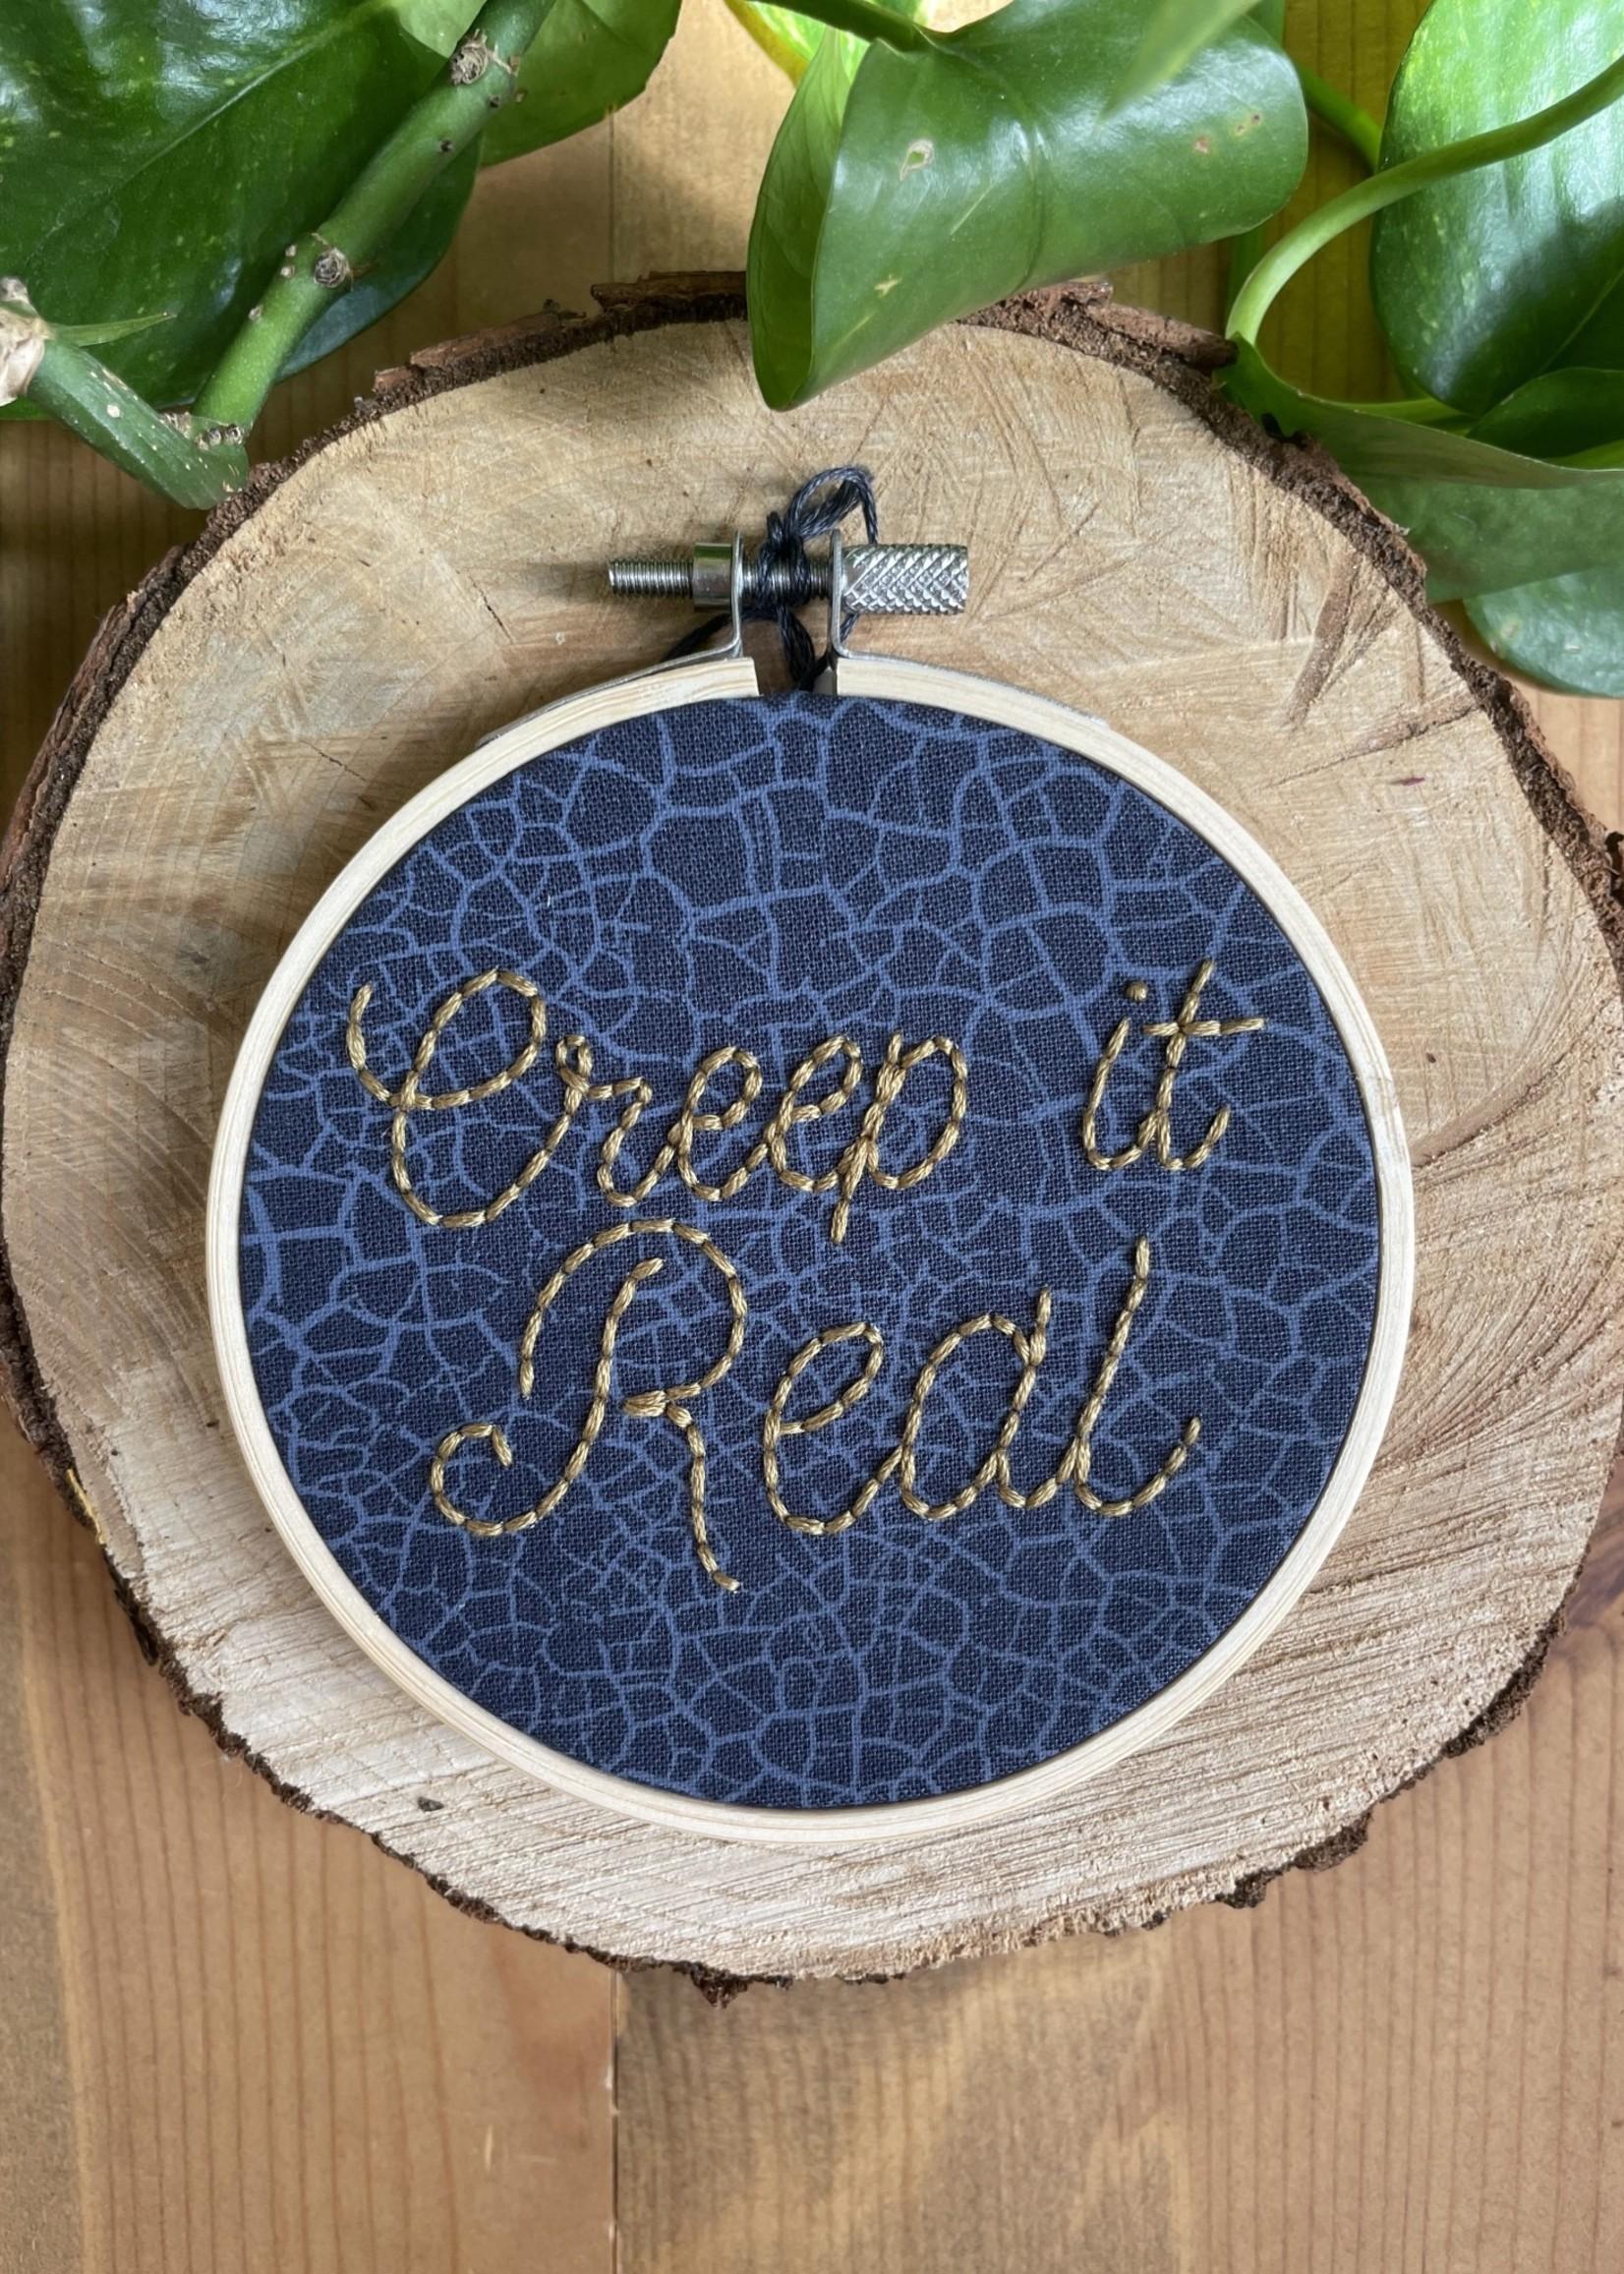 "sarcastitchery Sarcastitchery 4"" Embroidered Hoop"